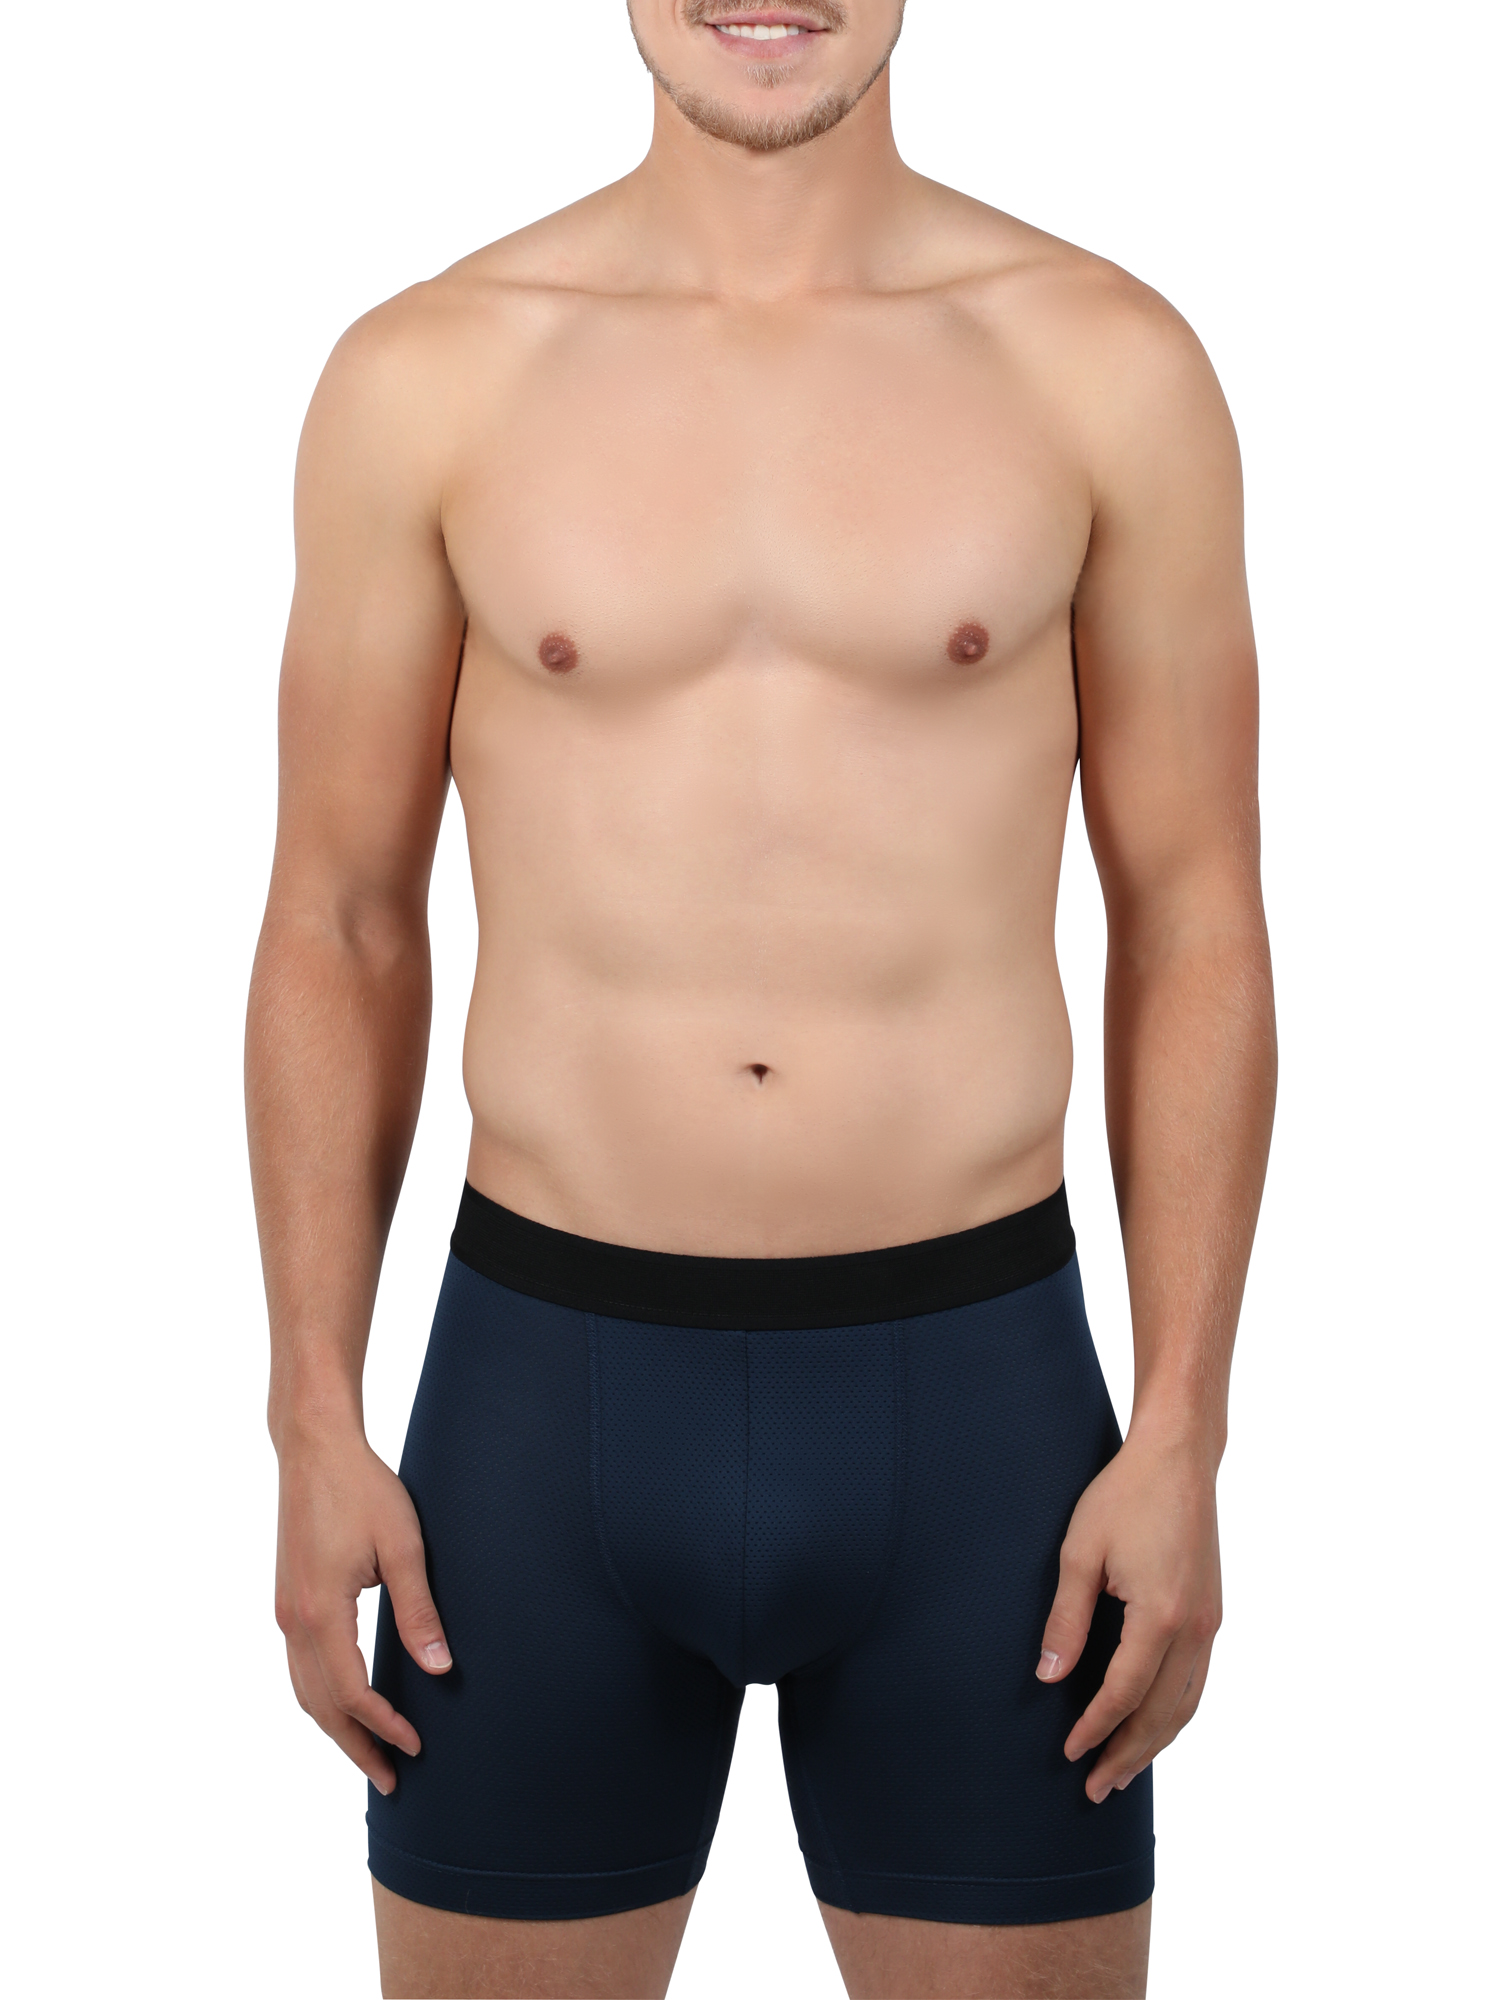 Web--ster Leopard Wild Jungle Men s Underwear Boxer Briefs Comfortable Slip Size L